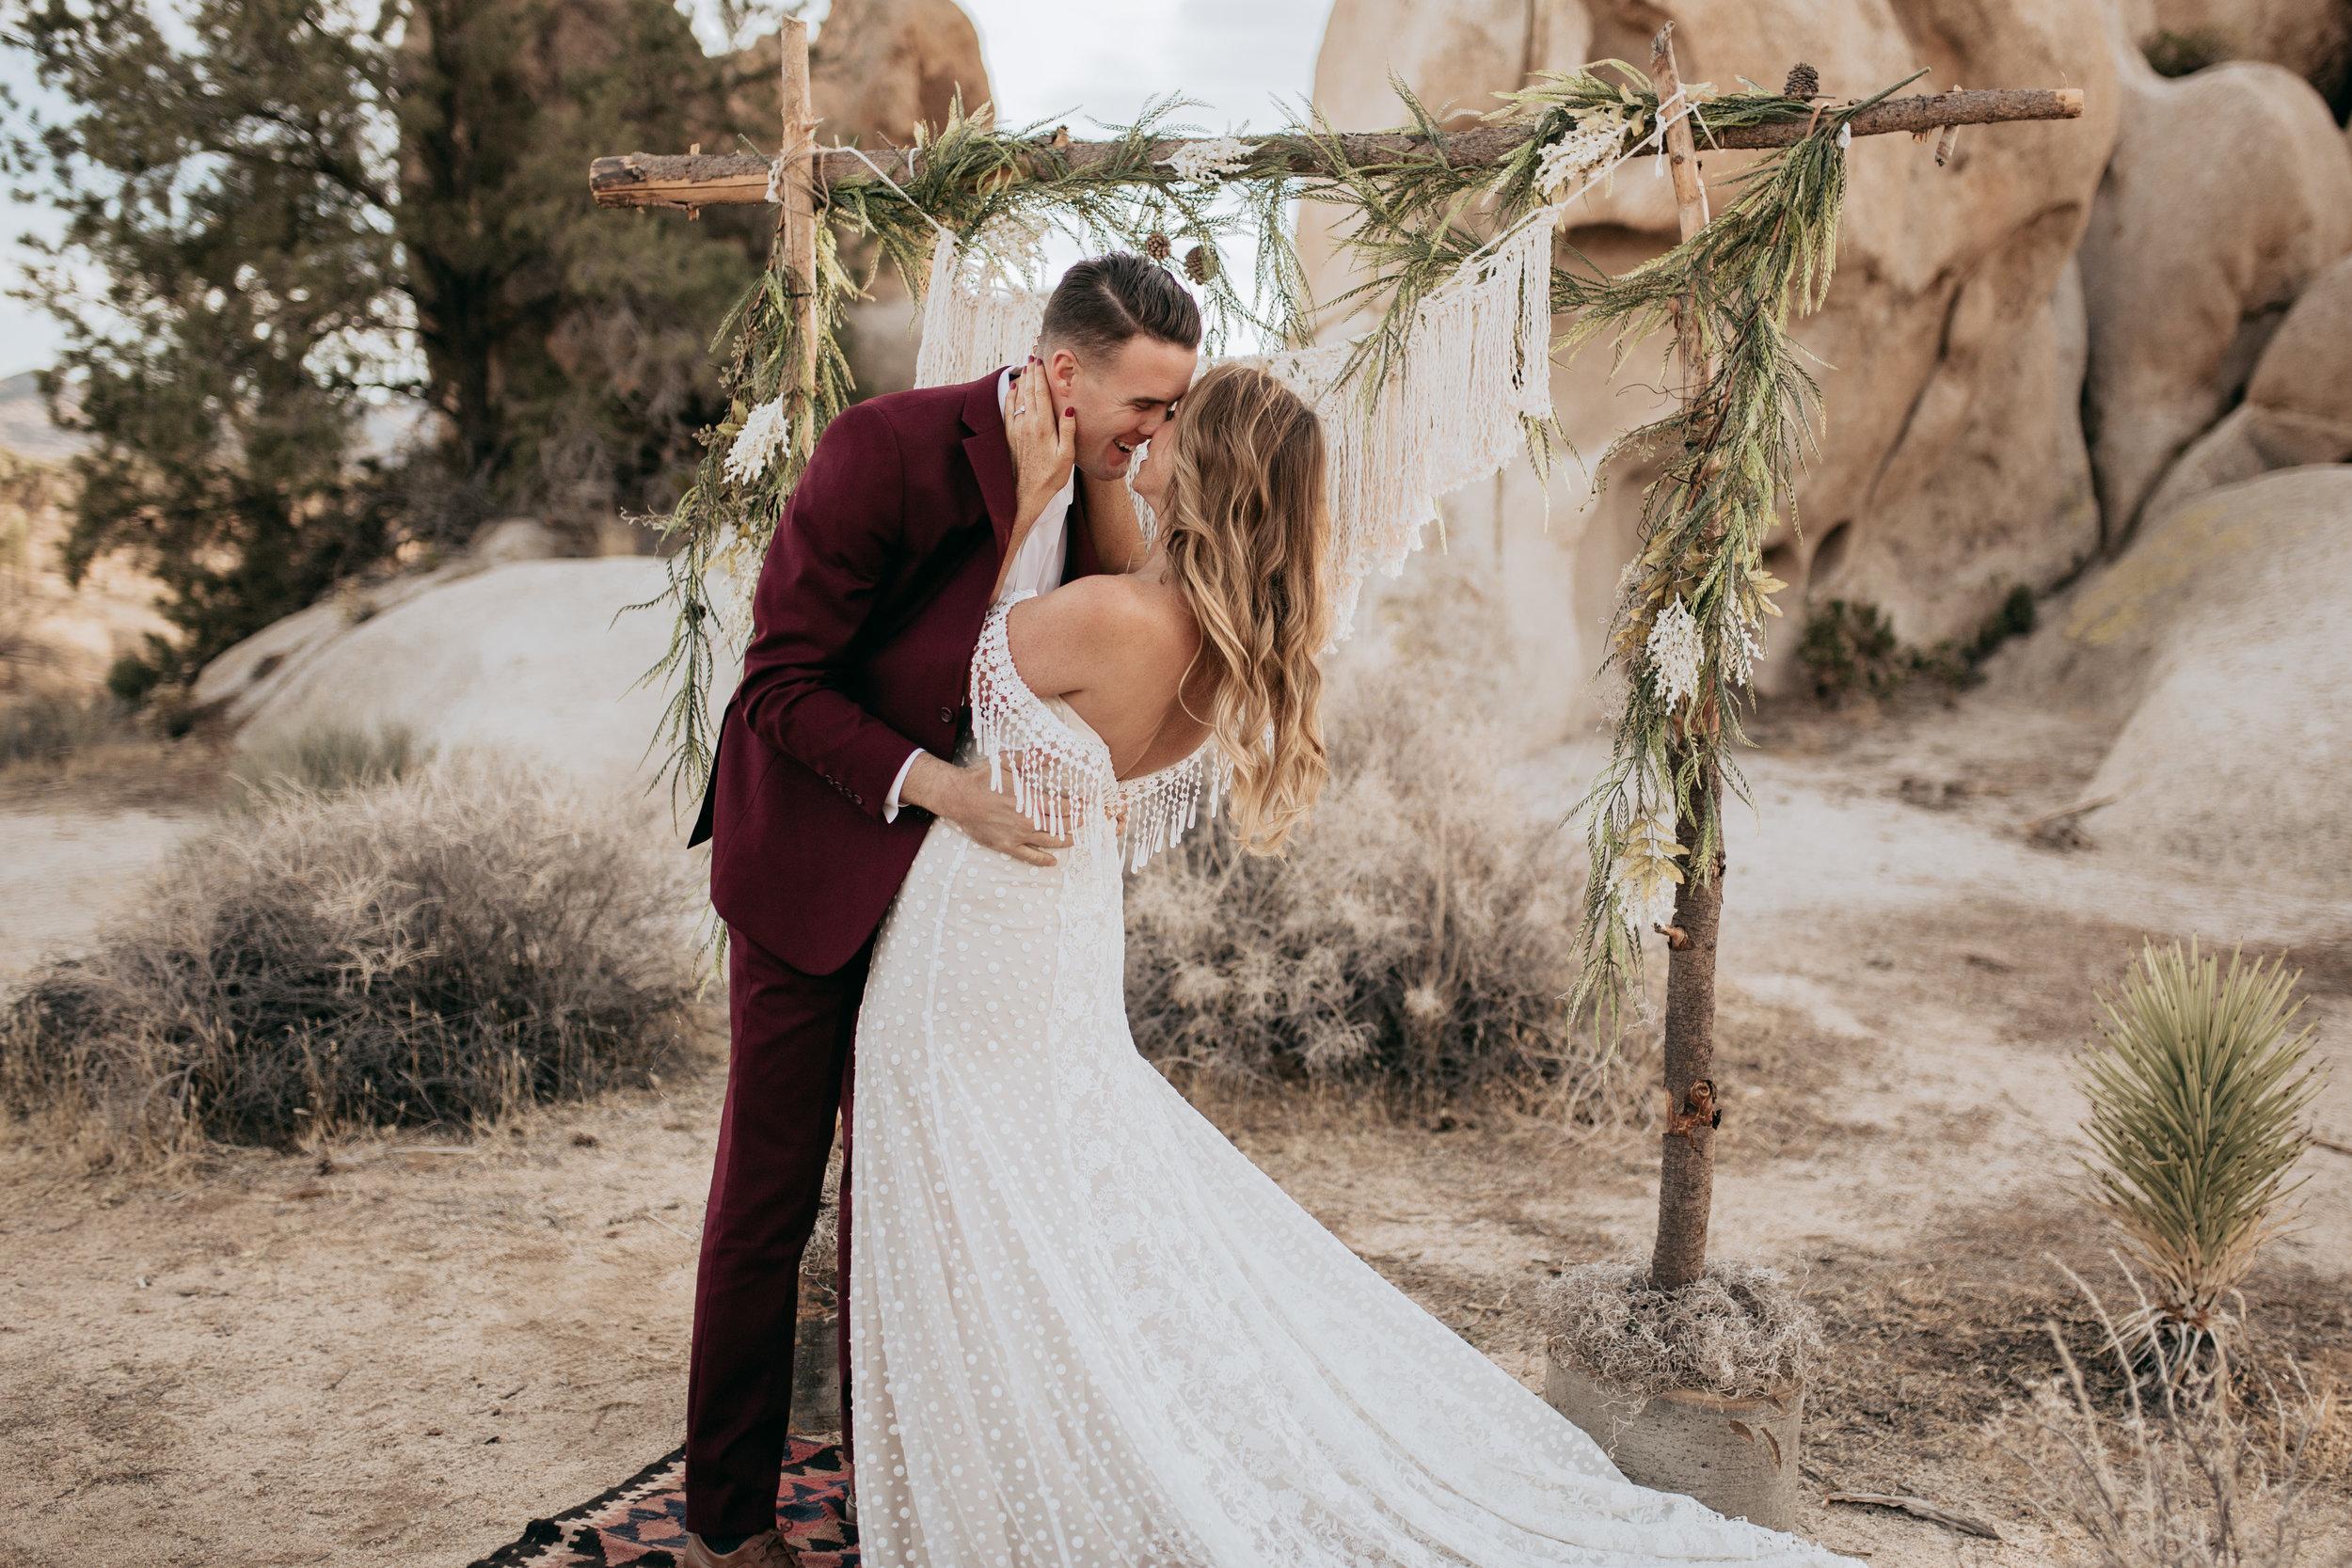 palmsprings_joshuatree_california_wedding_photographer-18.jpg